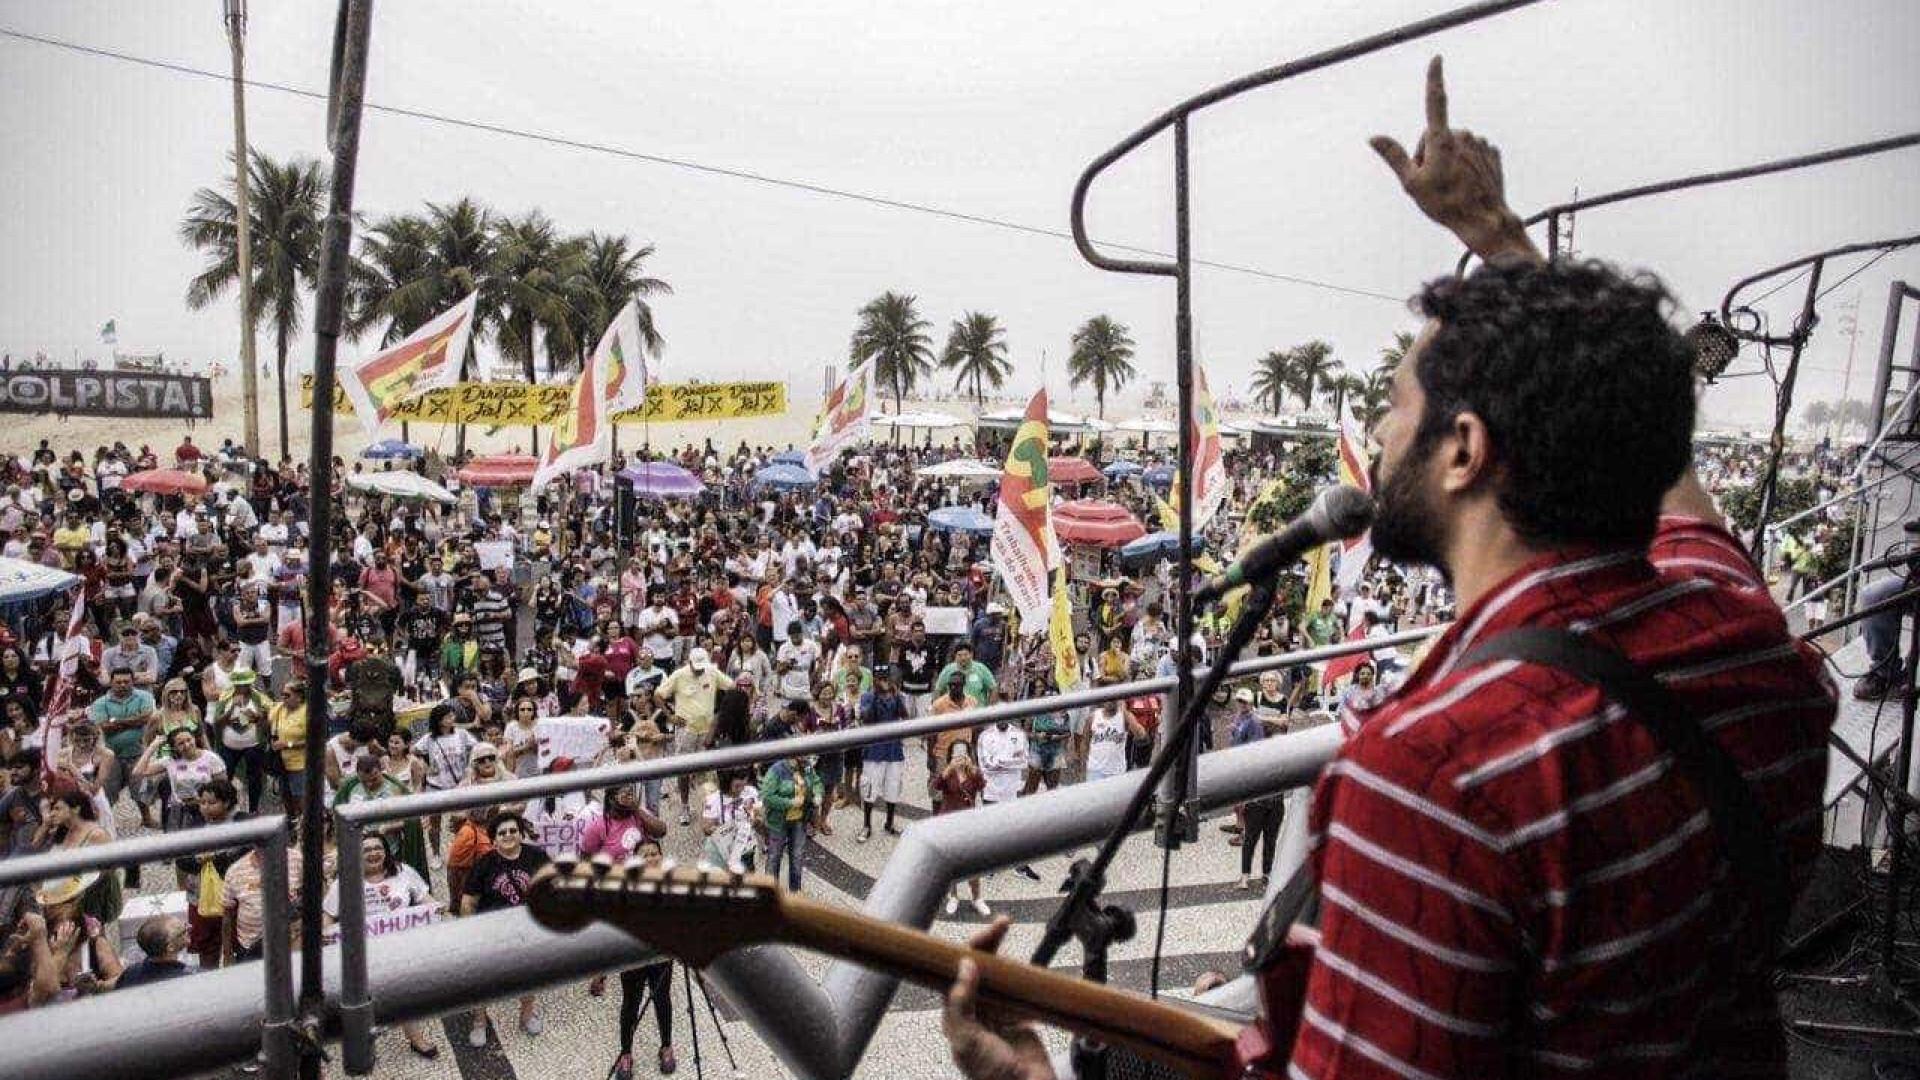 Confira as primeiras imagens de protesto 'Diretas Já' no Rio